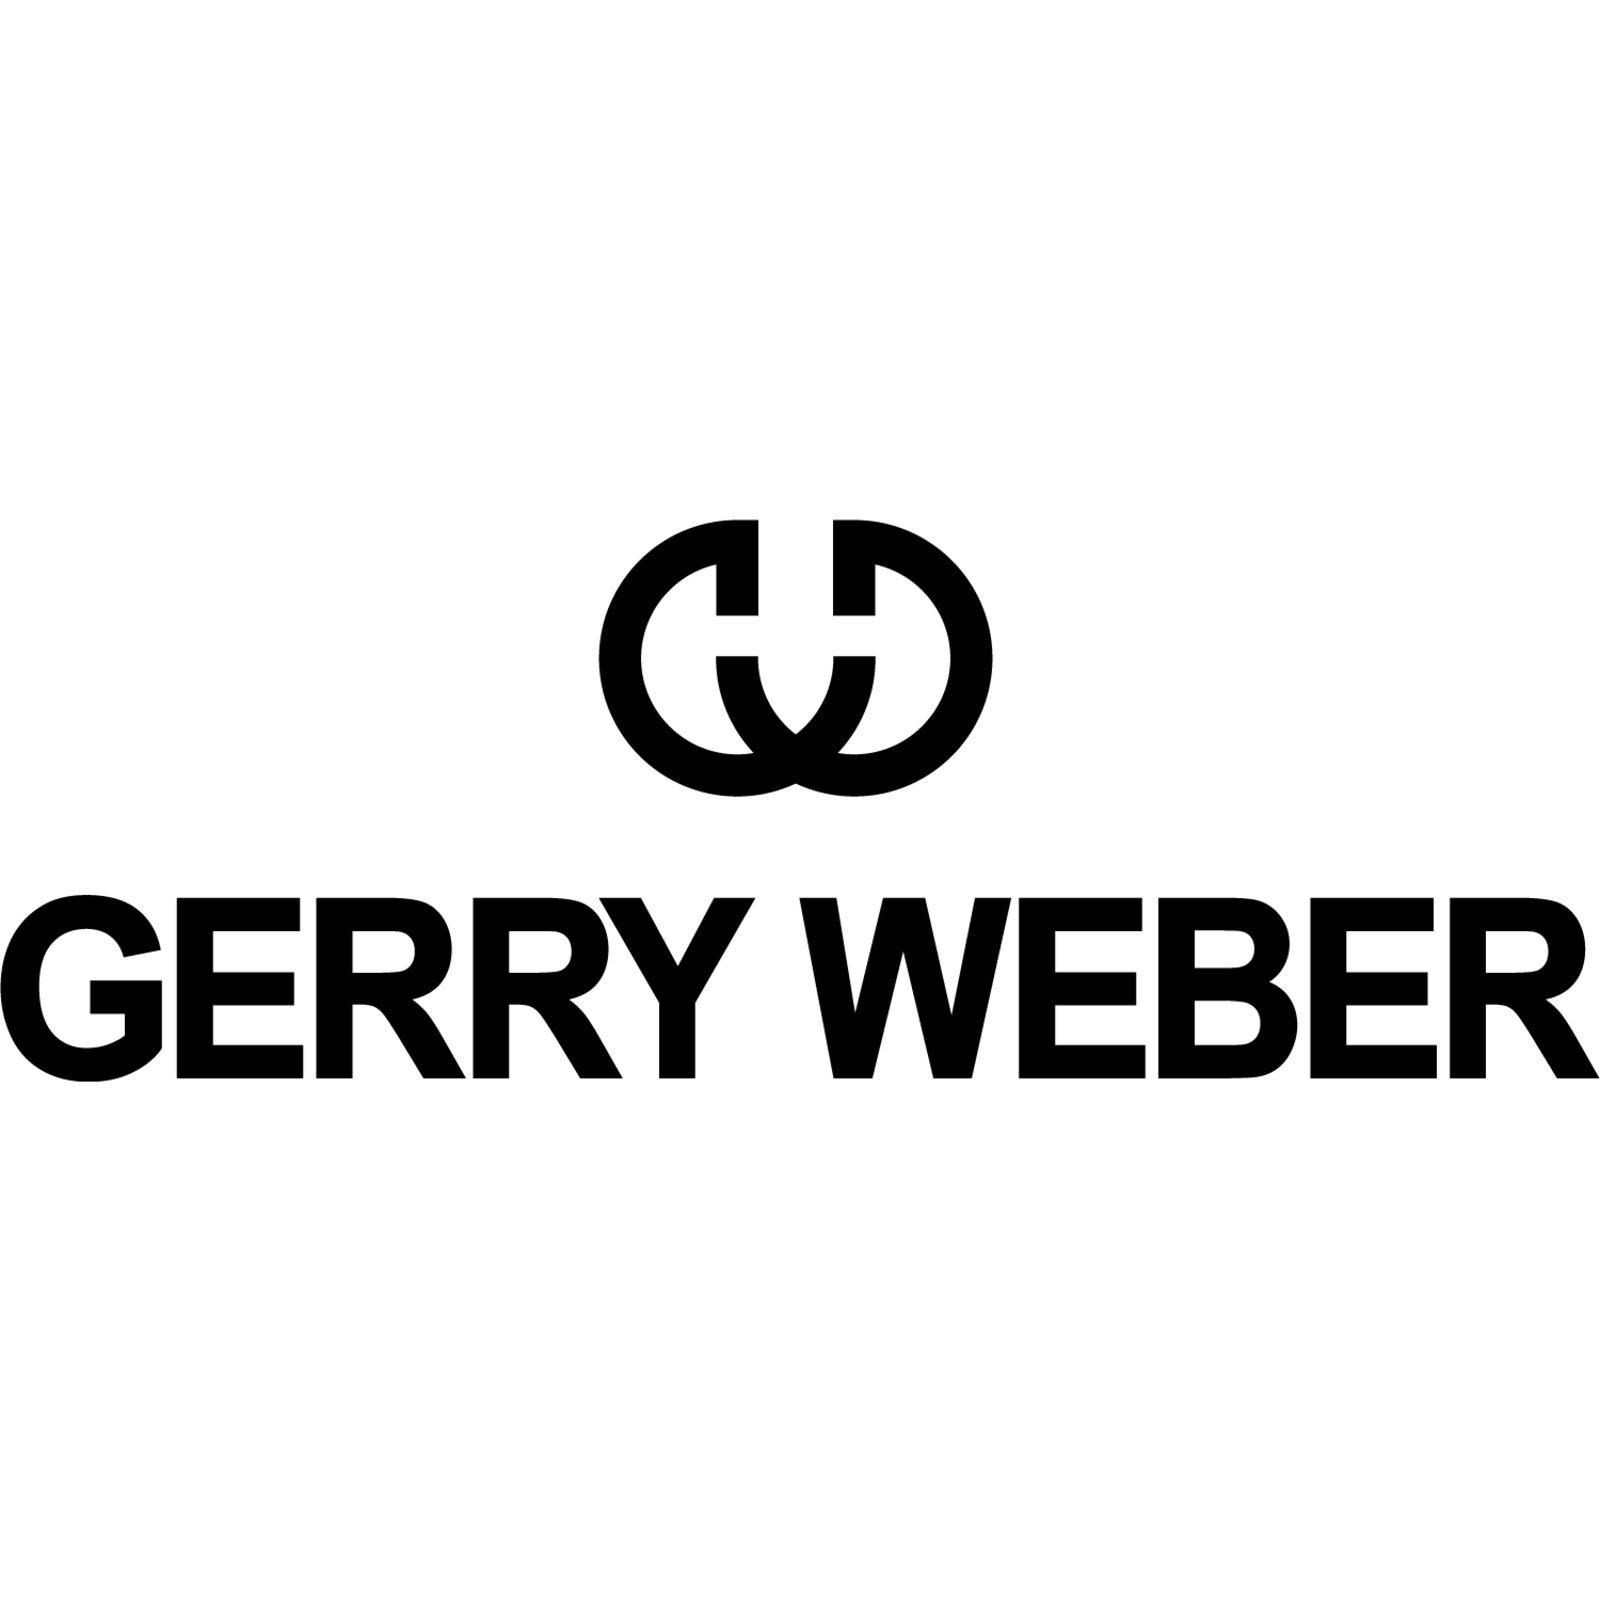 GERRY WEBER (Bild 1)